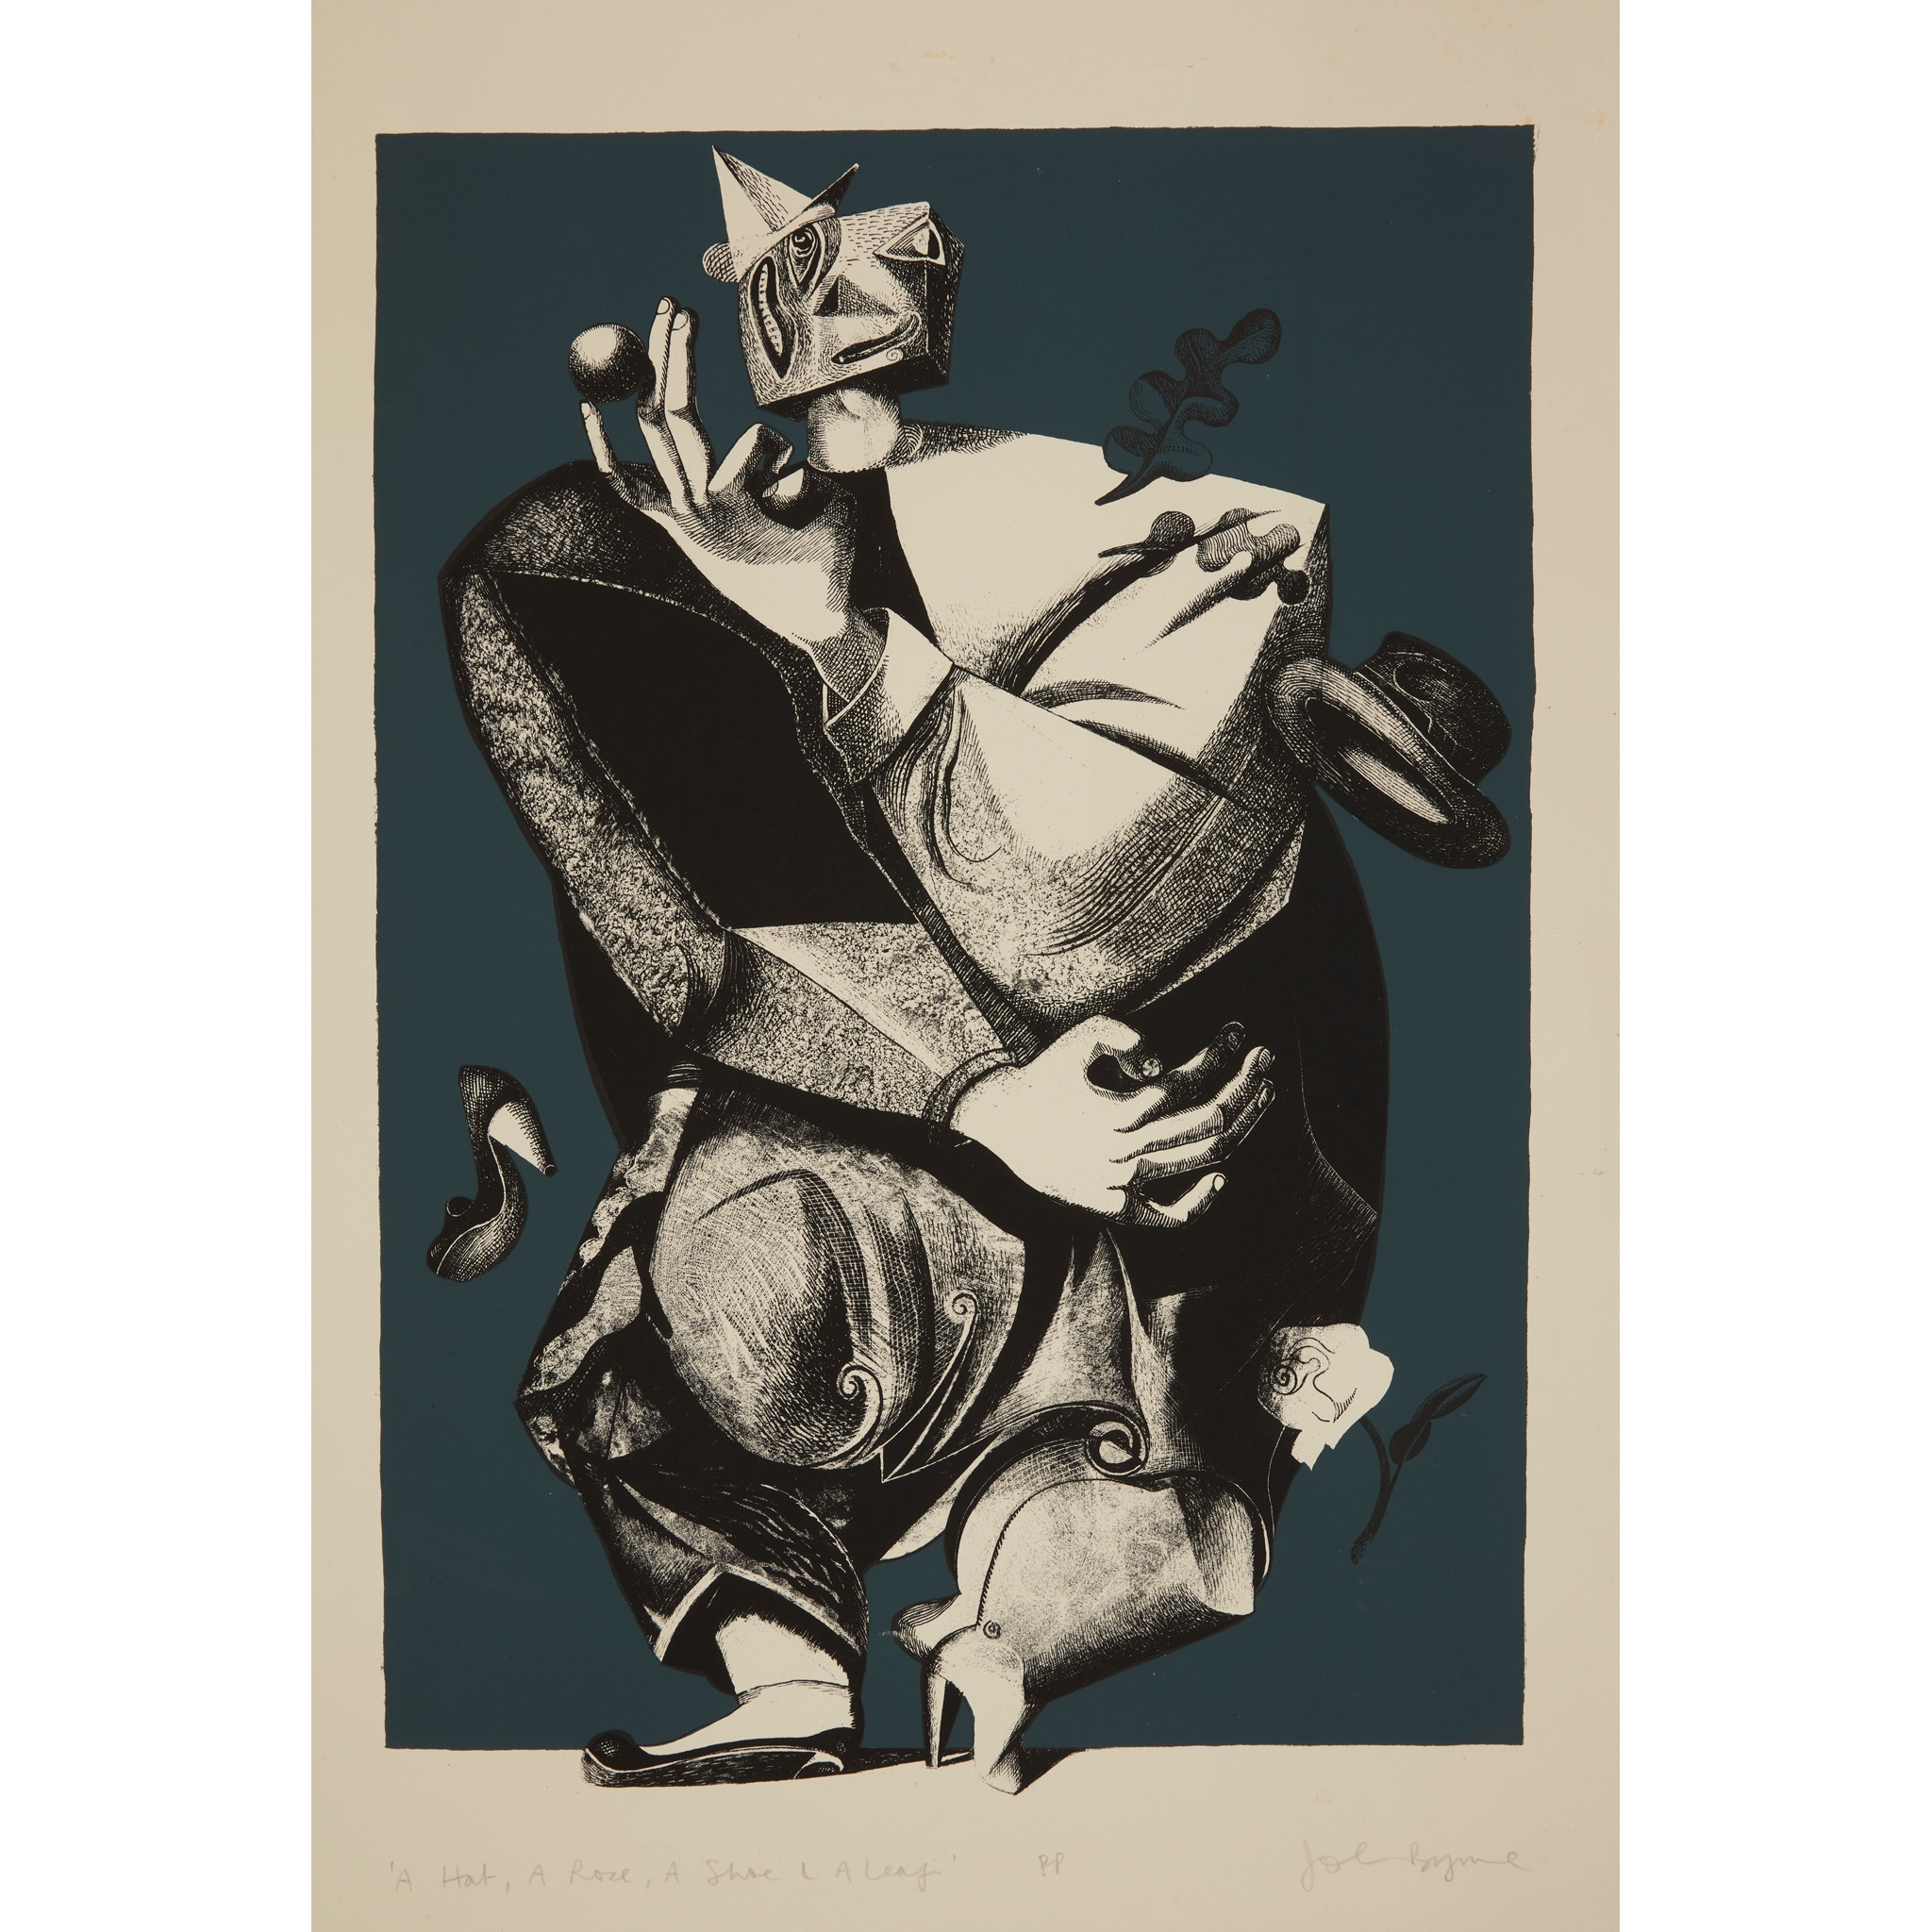 § JOHN BYRNE (SCOTTISH 1940-) A HAT, A ROSE, A SHOE AND A LEAF - 1999